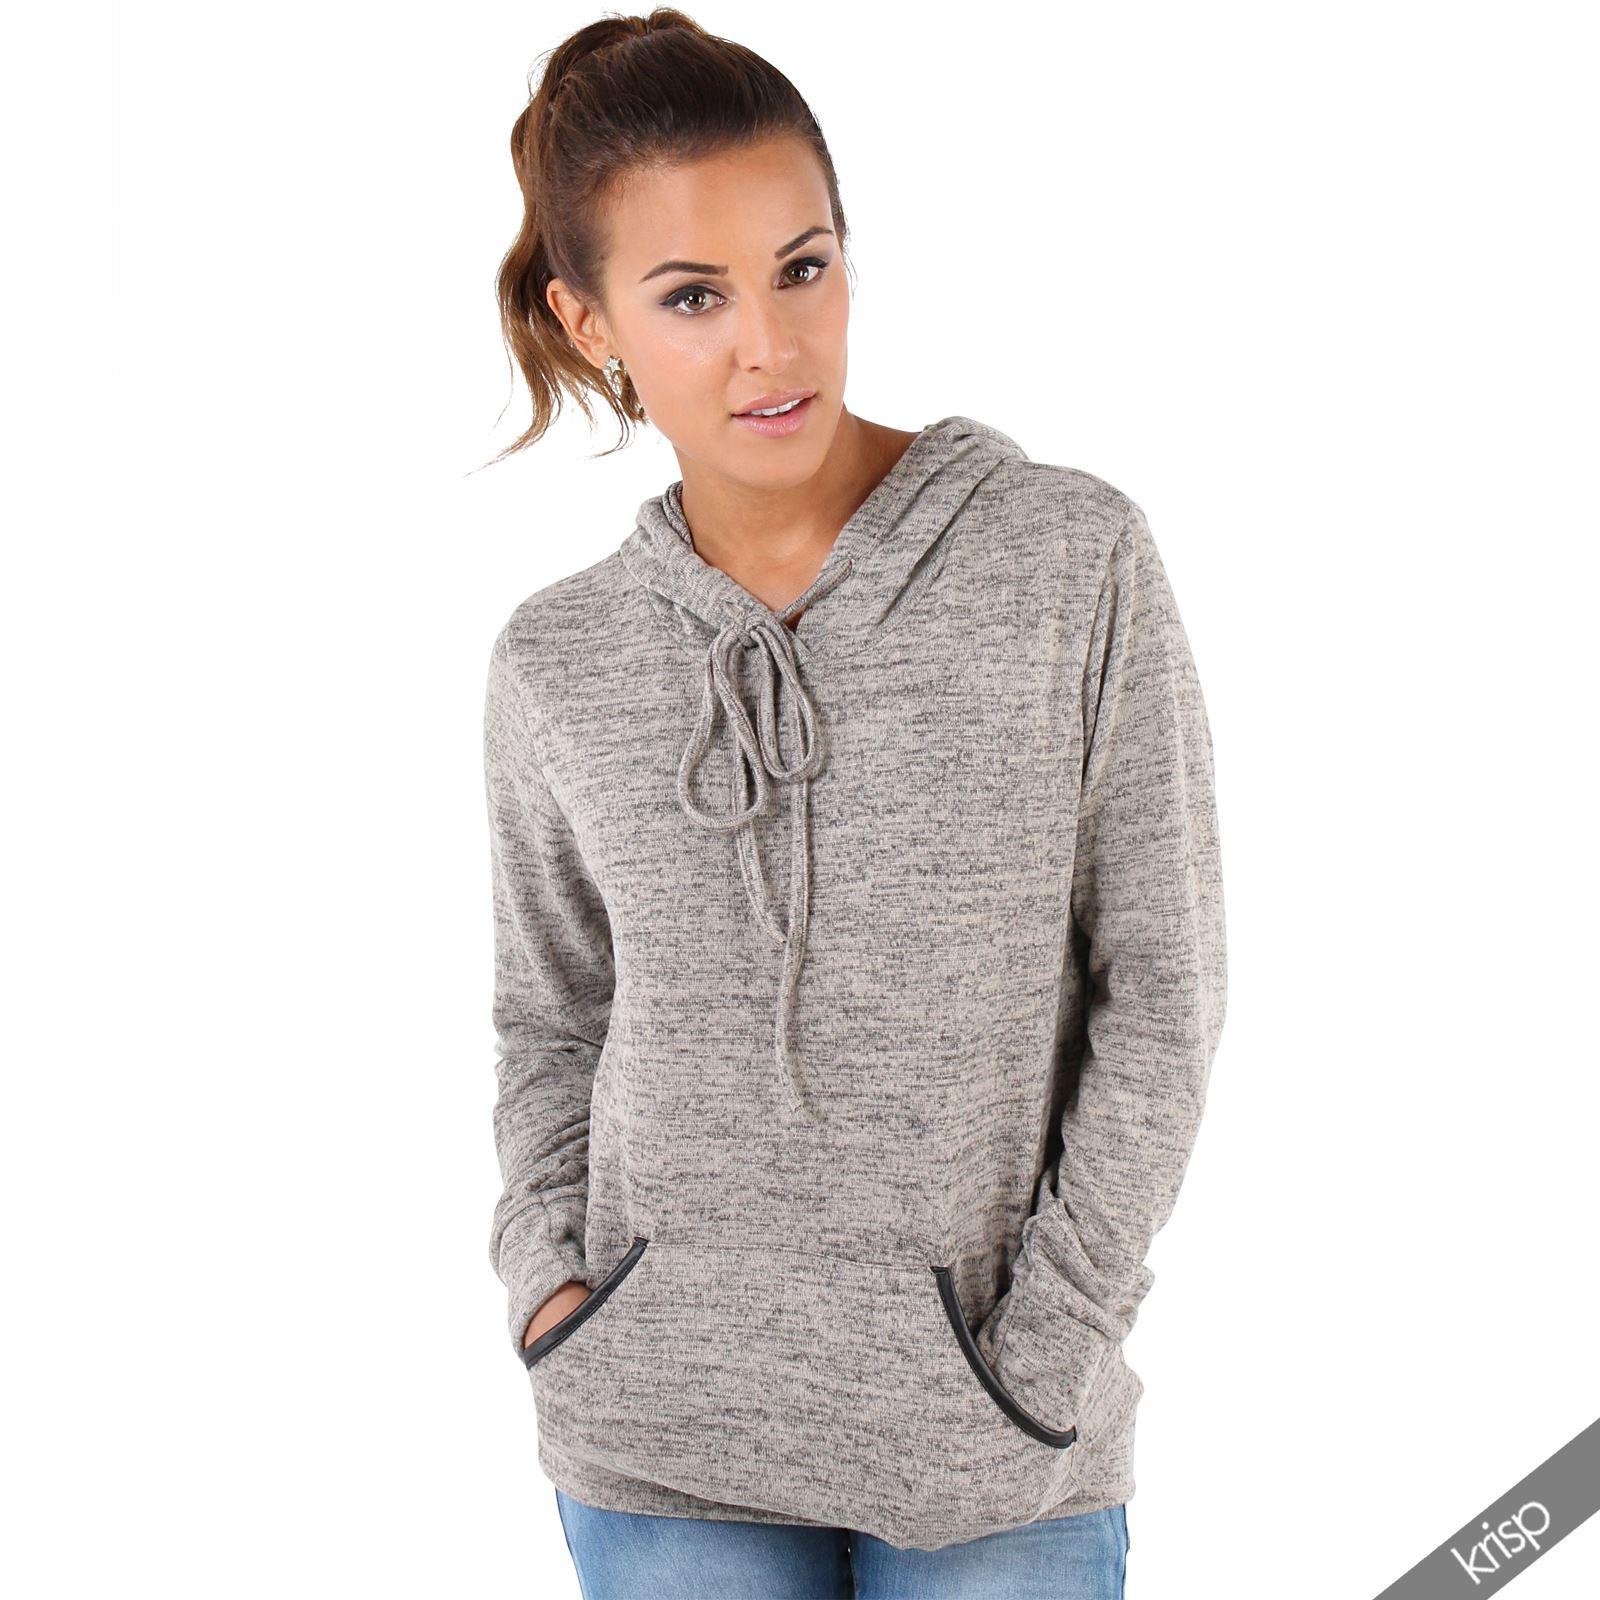 Womens-Soft-Marl-Knit-Hoodie-Hooded-Loose-Baggy-Jumper-Sweater-Top-Sweatshirt thumbnail 11